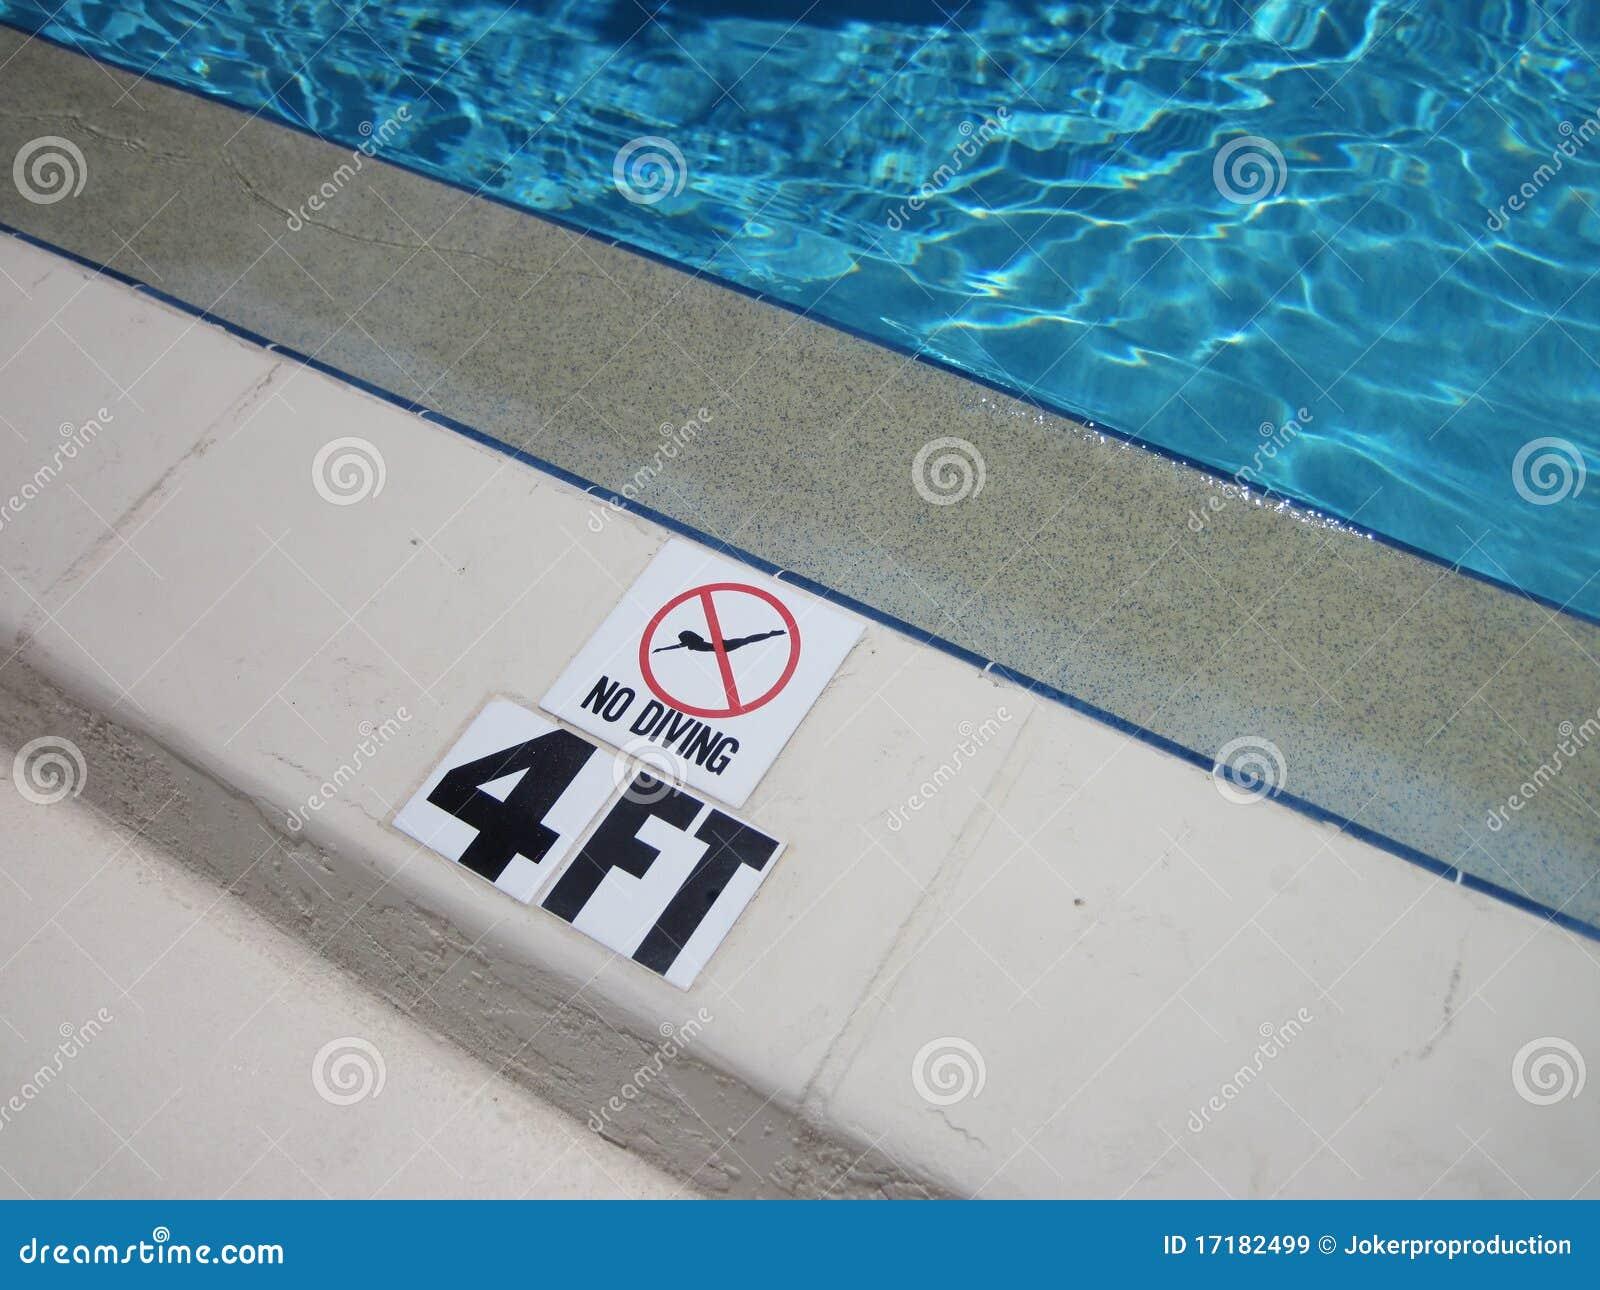 Chlorine danger sign stock photography - Dangers of chlorine in swimming pools ...